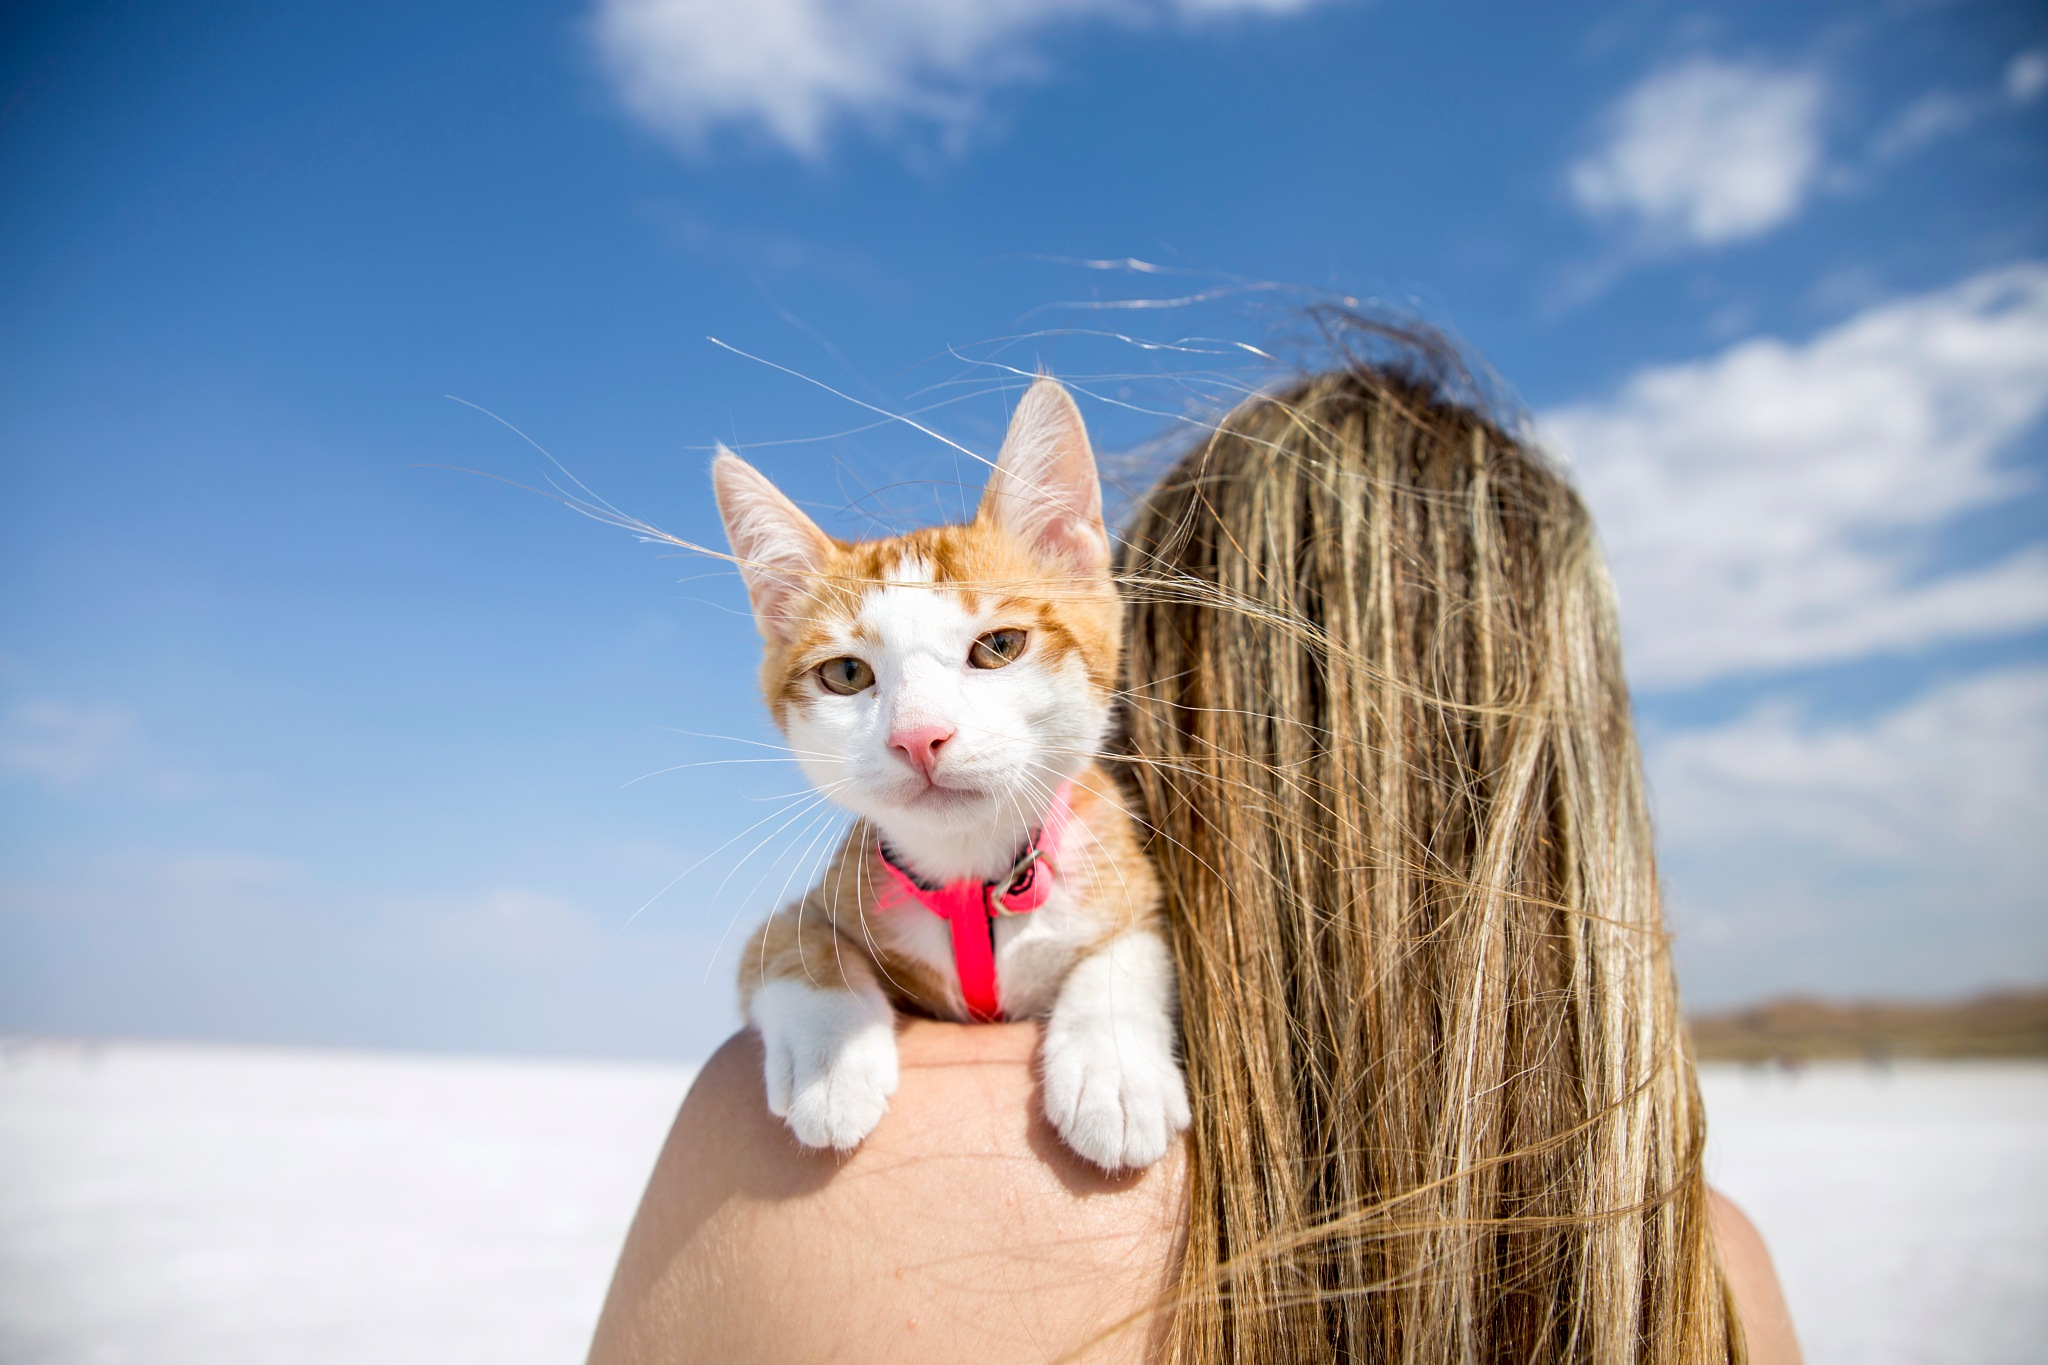 Sweet Cat by Ziya YILDIRIM